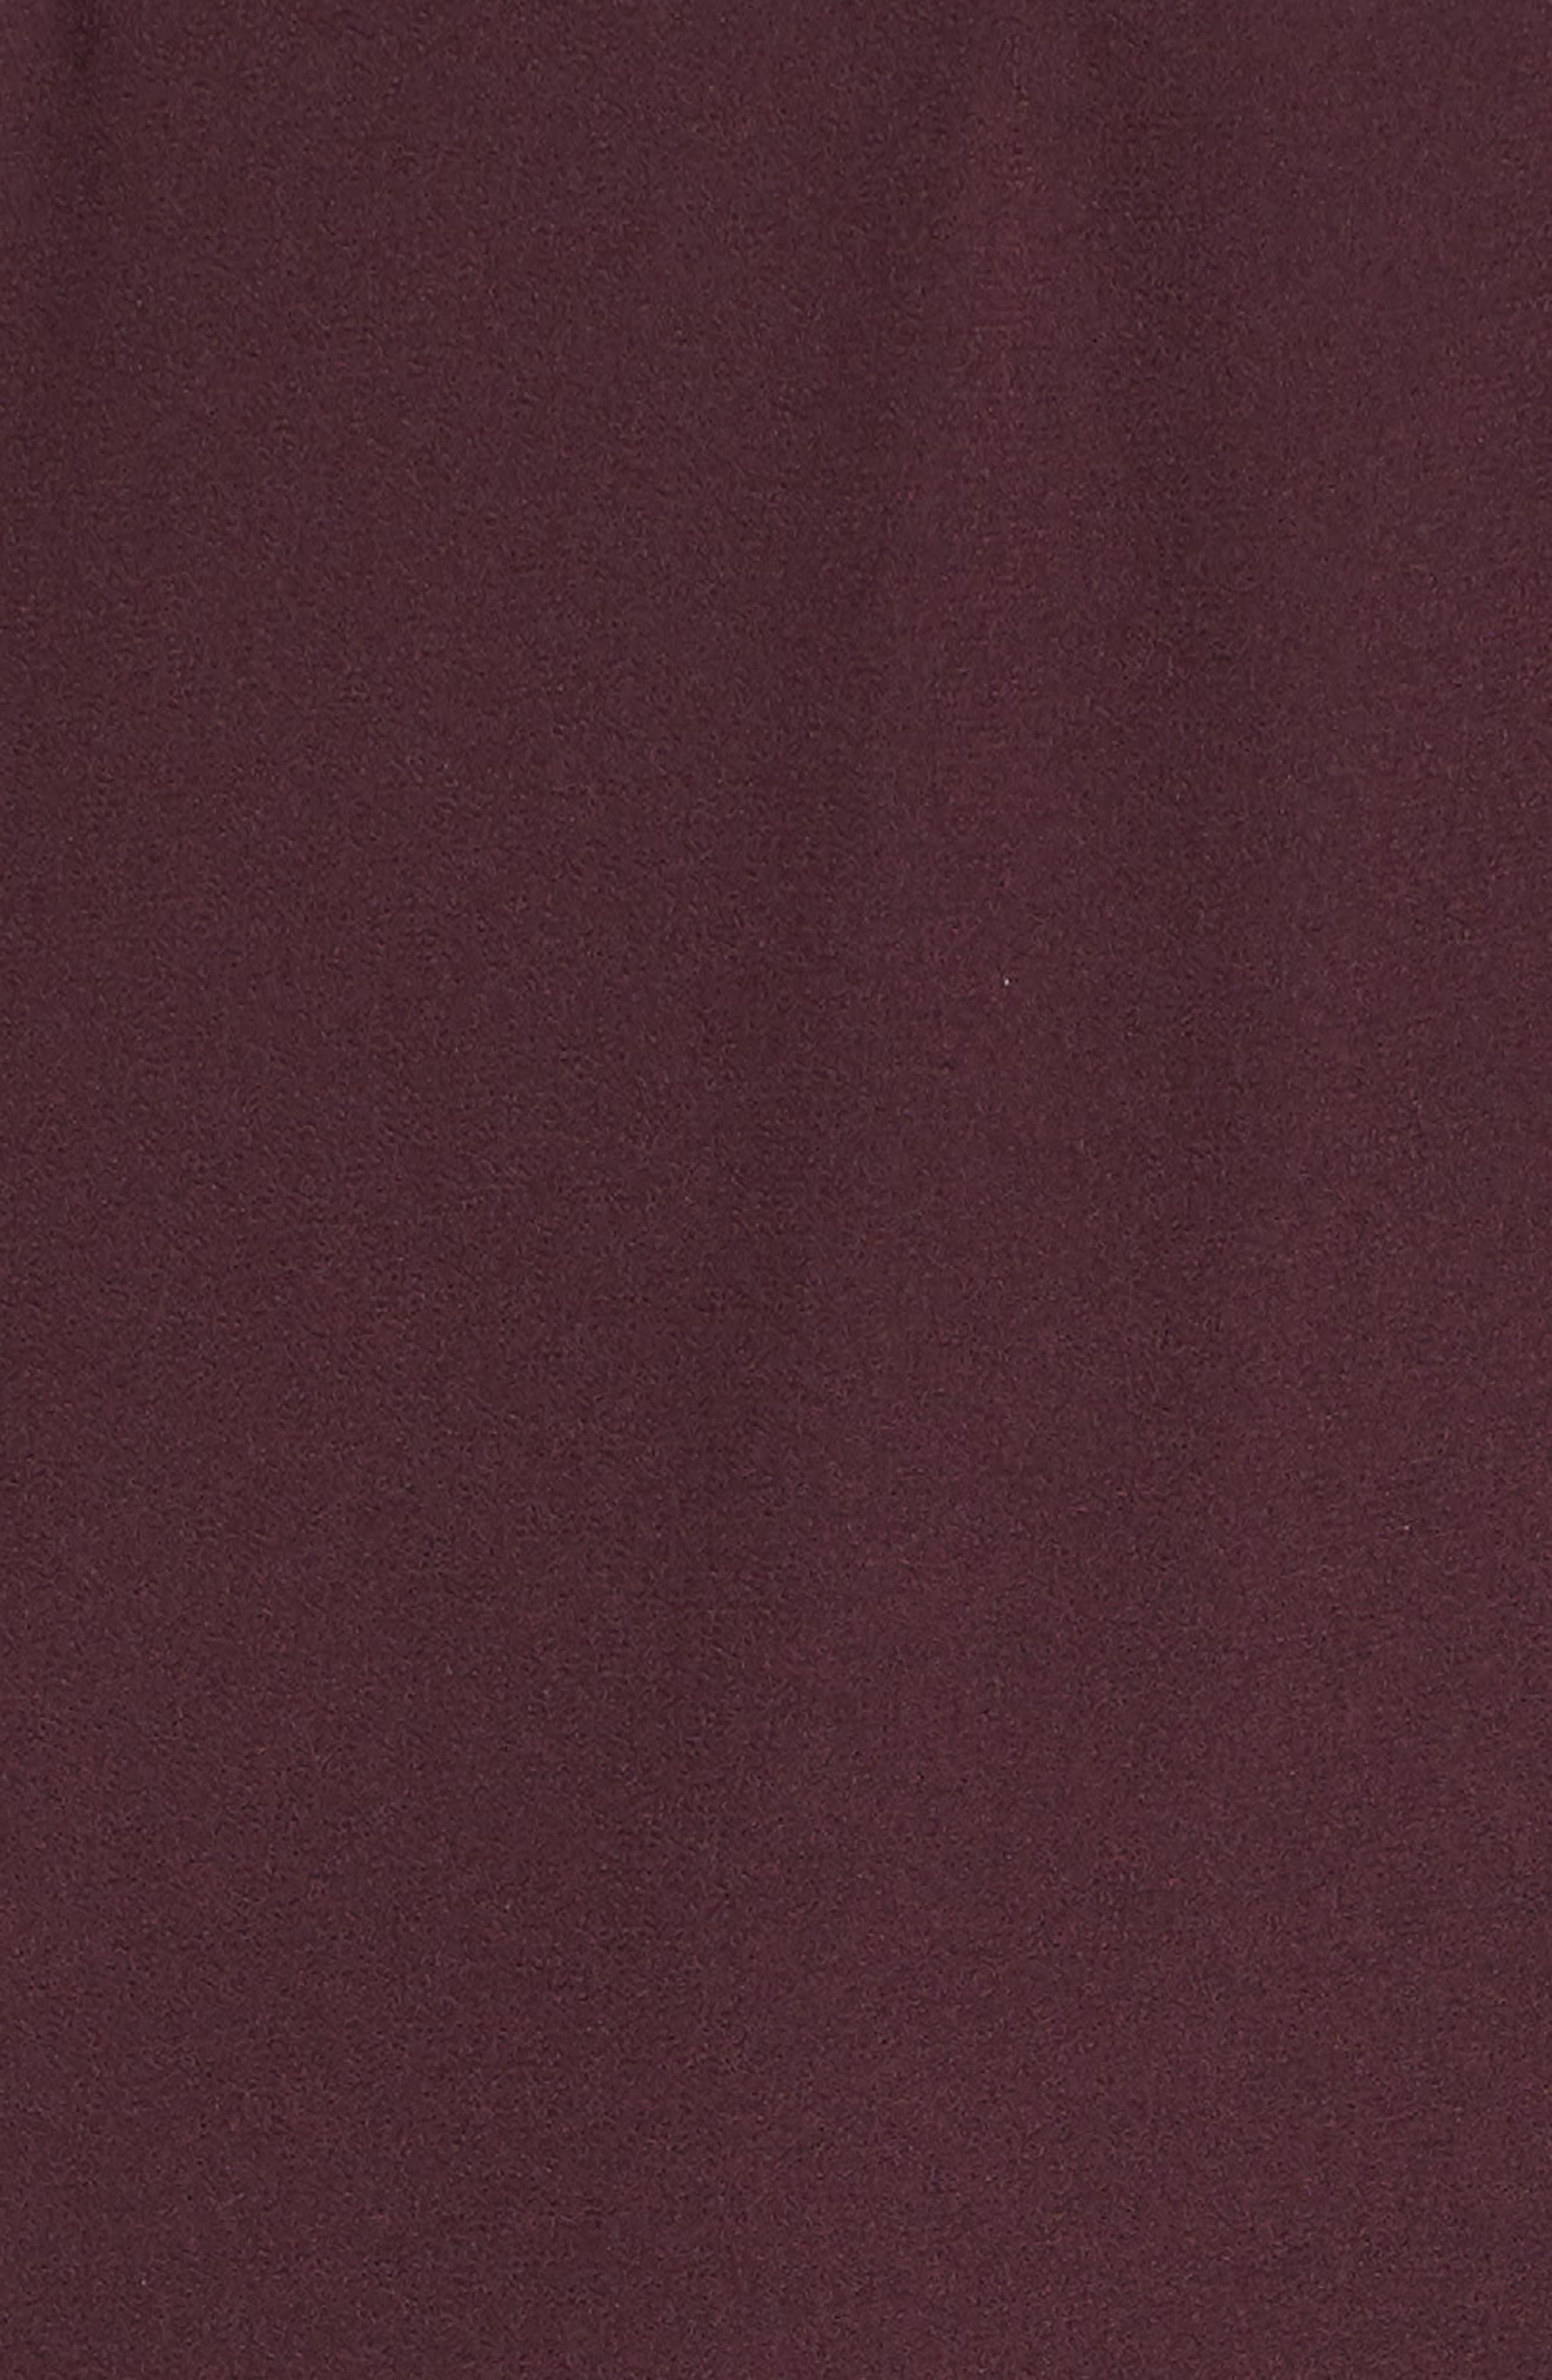 Pleat Detail Midi Dress,                             Alternate thumbnail 5, color,                             BURGUNDY STEM